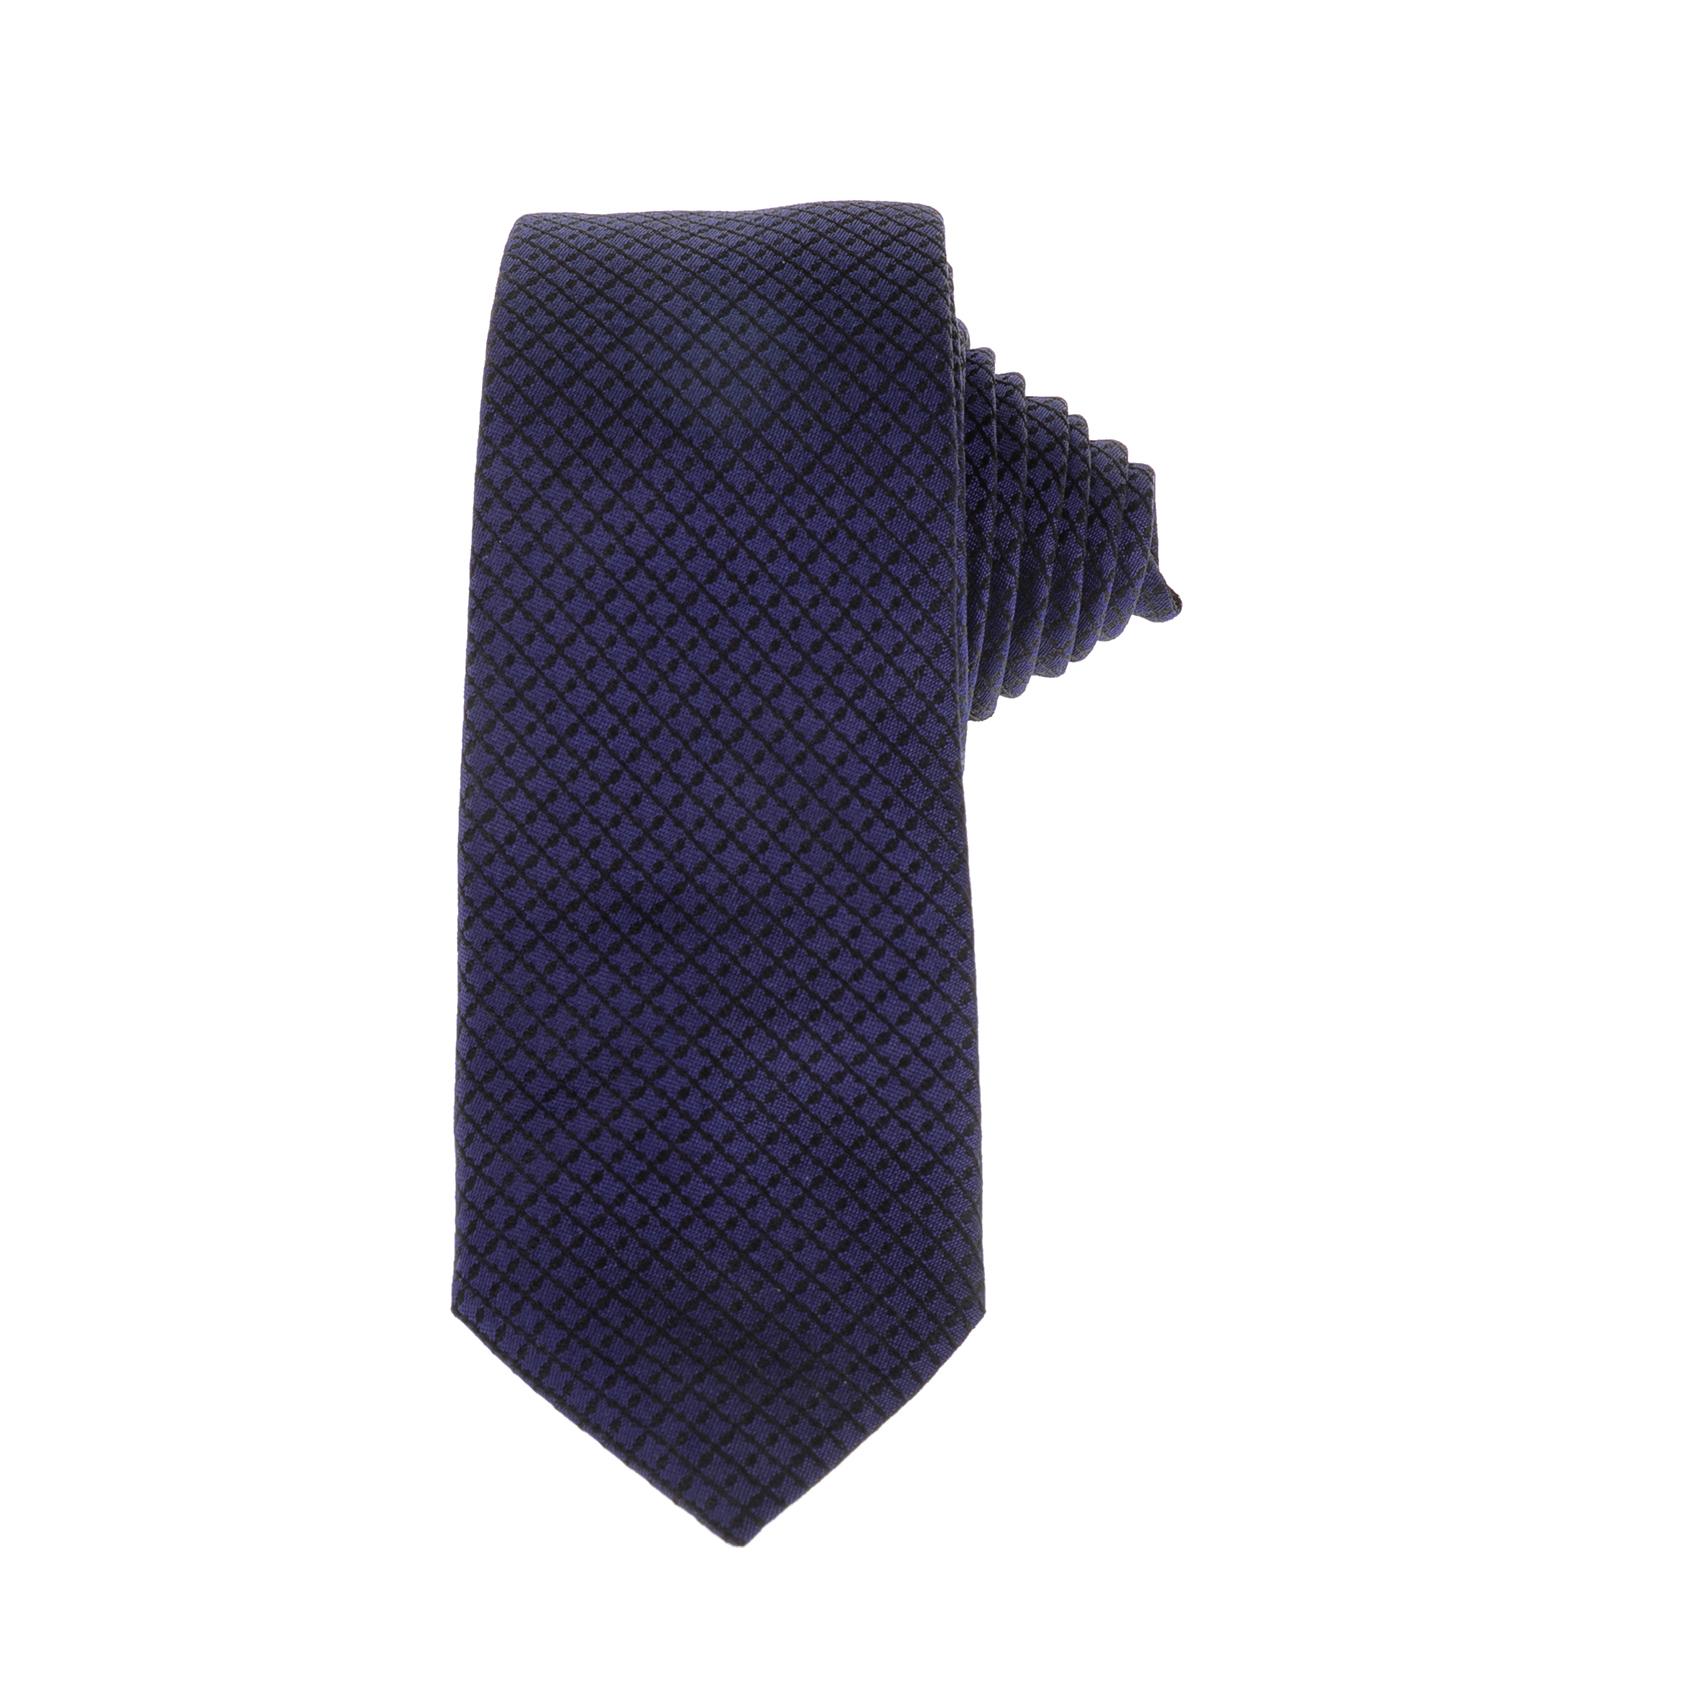 CK - Ανδρική γραβάτα CK NAVELLI μπλε ανδρικά αξεσουάρ γραβάτες